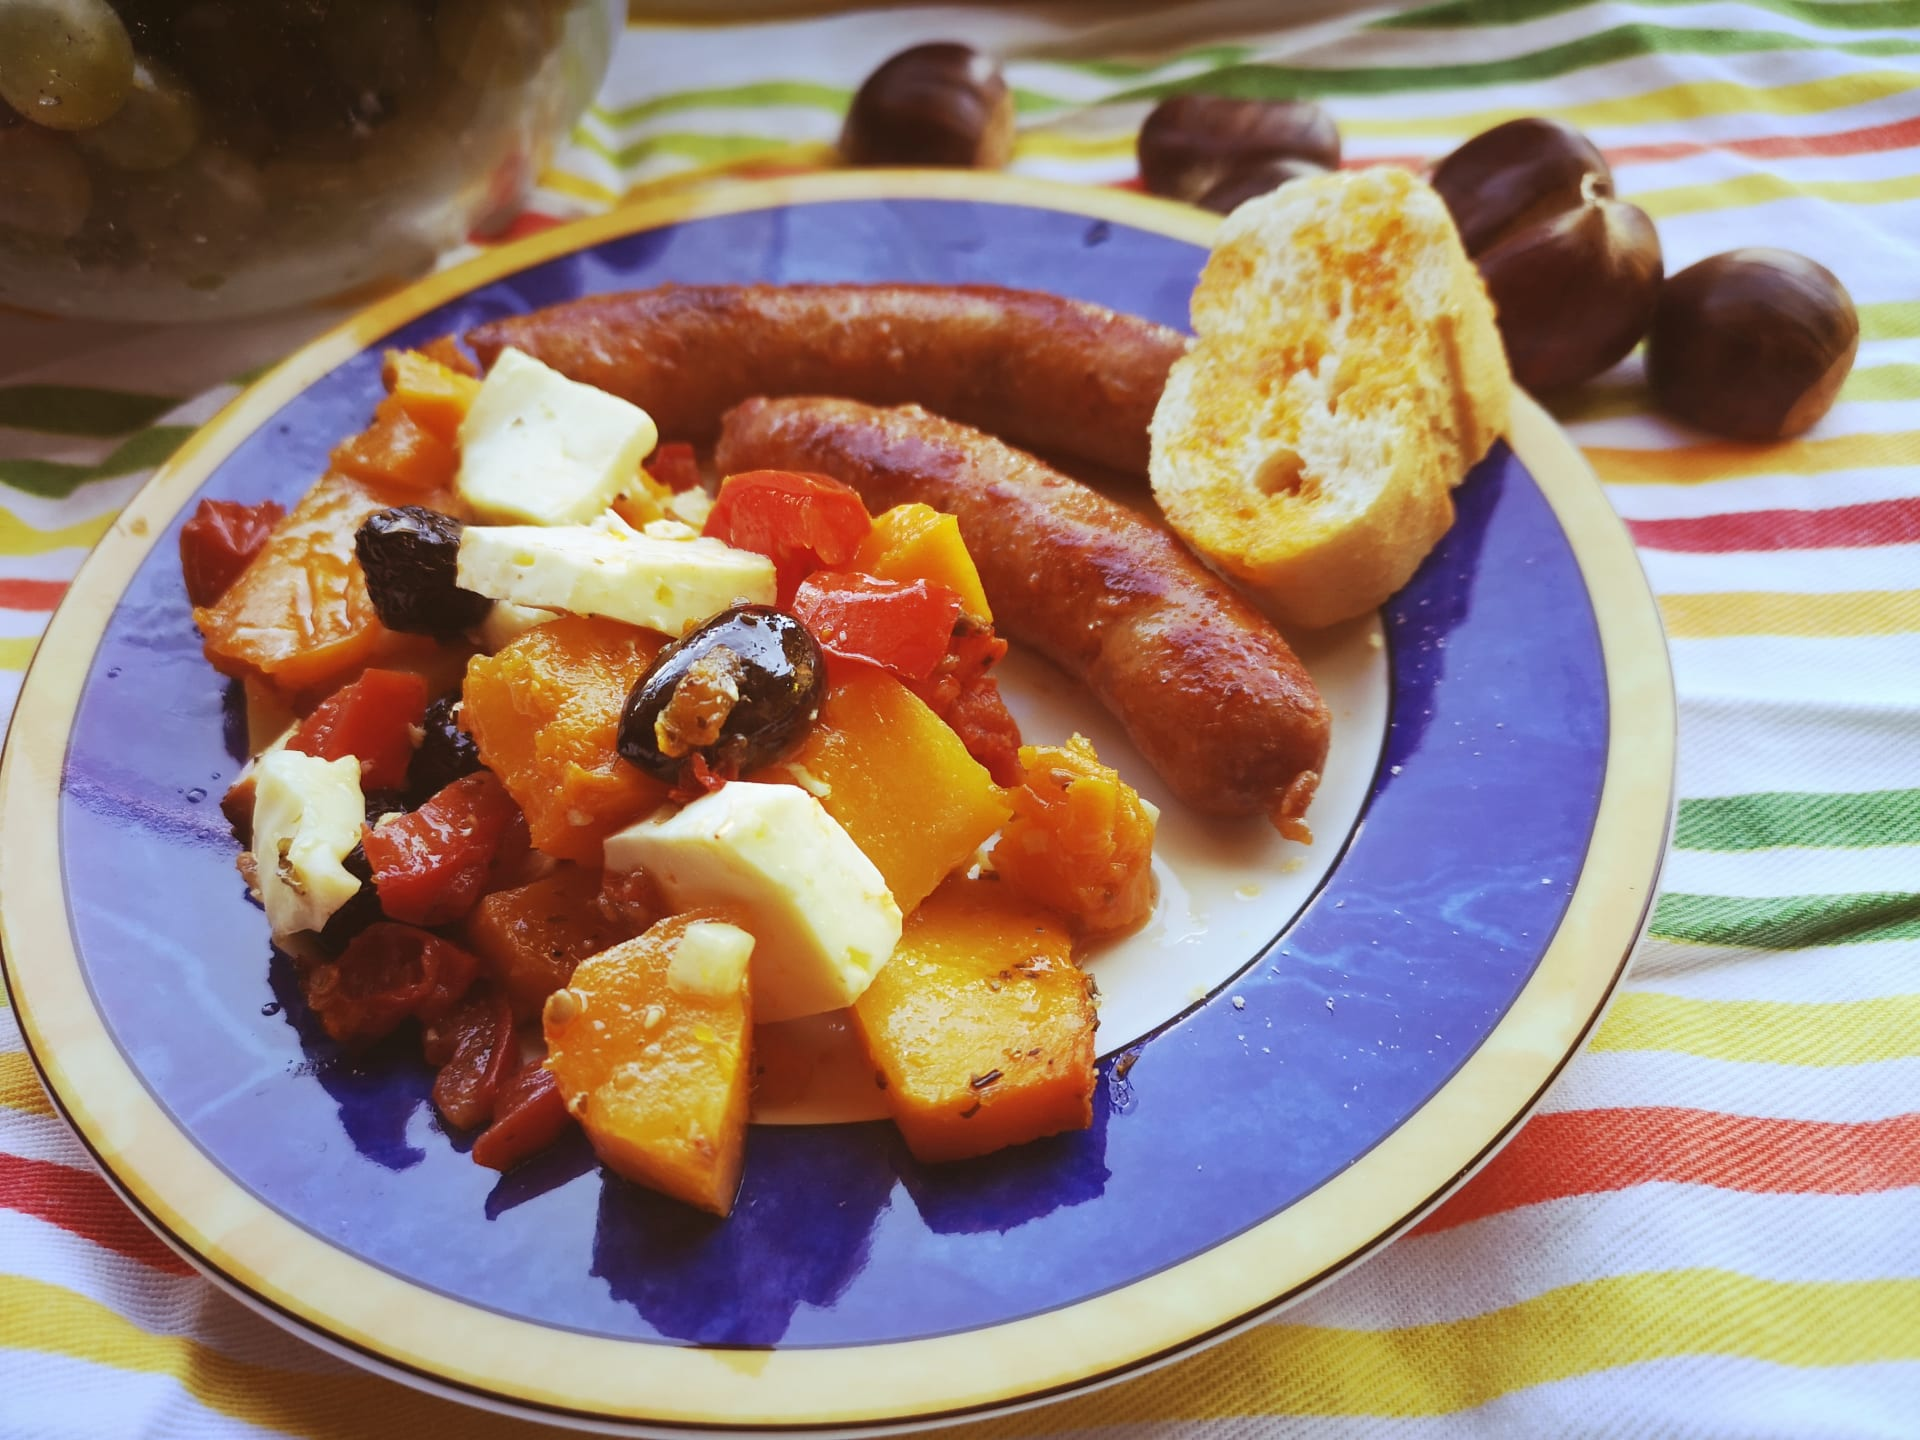 Zapečena buča s rajčicom, maslinama i sirom škripavcem